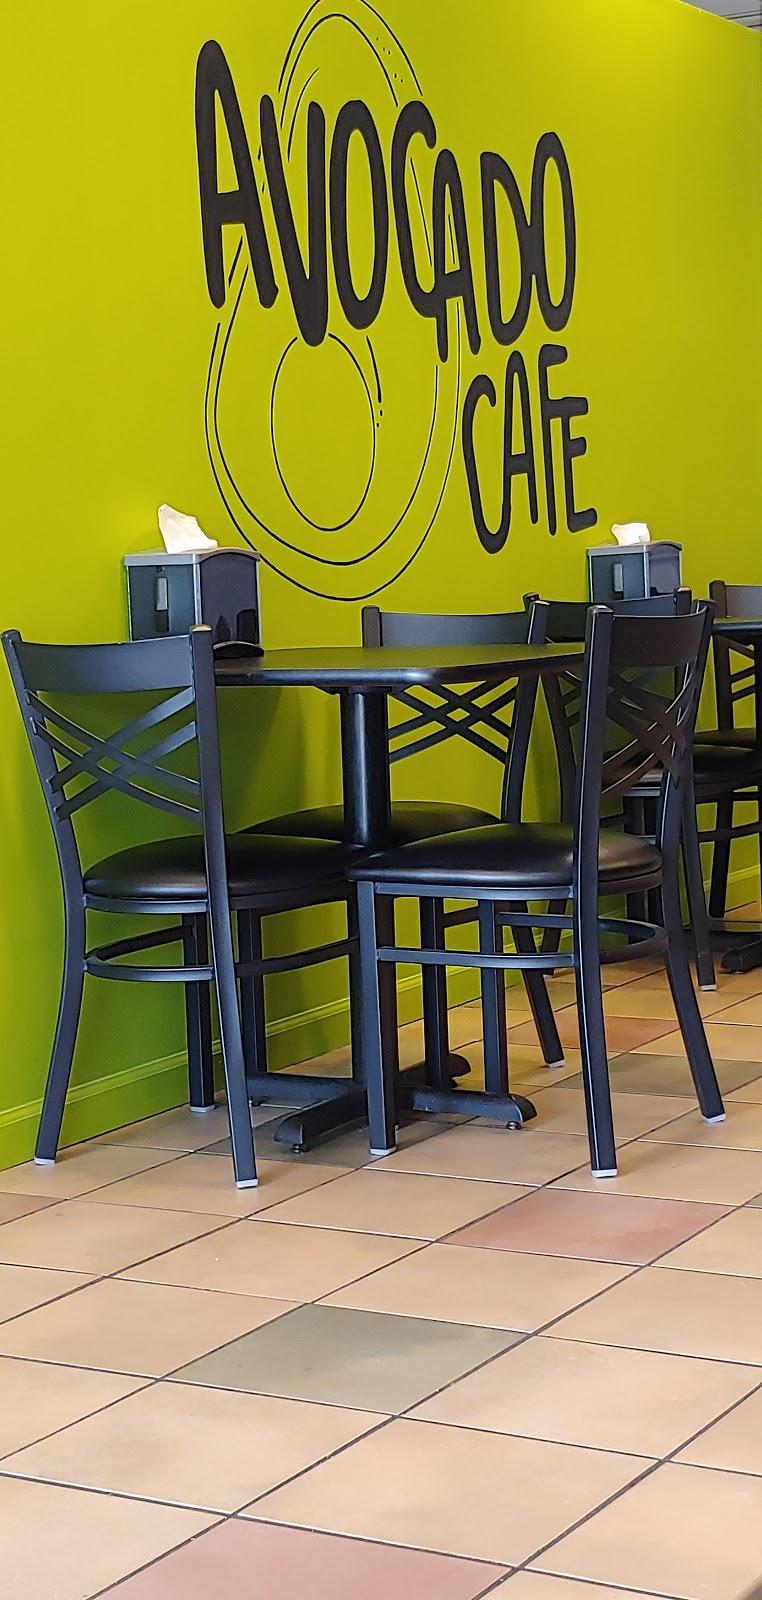 Avocado Cafe   restaurant   1048 Lincoln Way E, Chambersburg, PA 17201, USA   7175048589 OR +1 717-504-8589